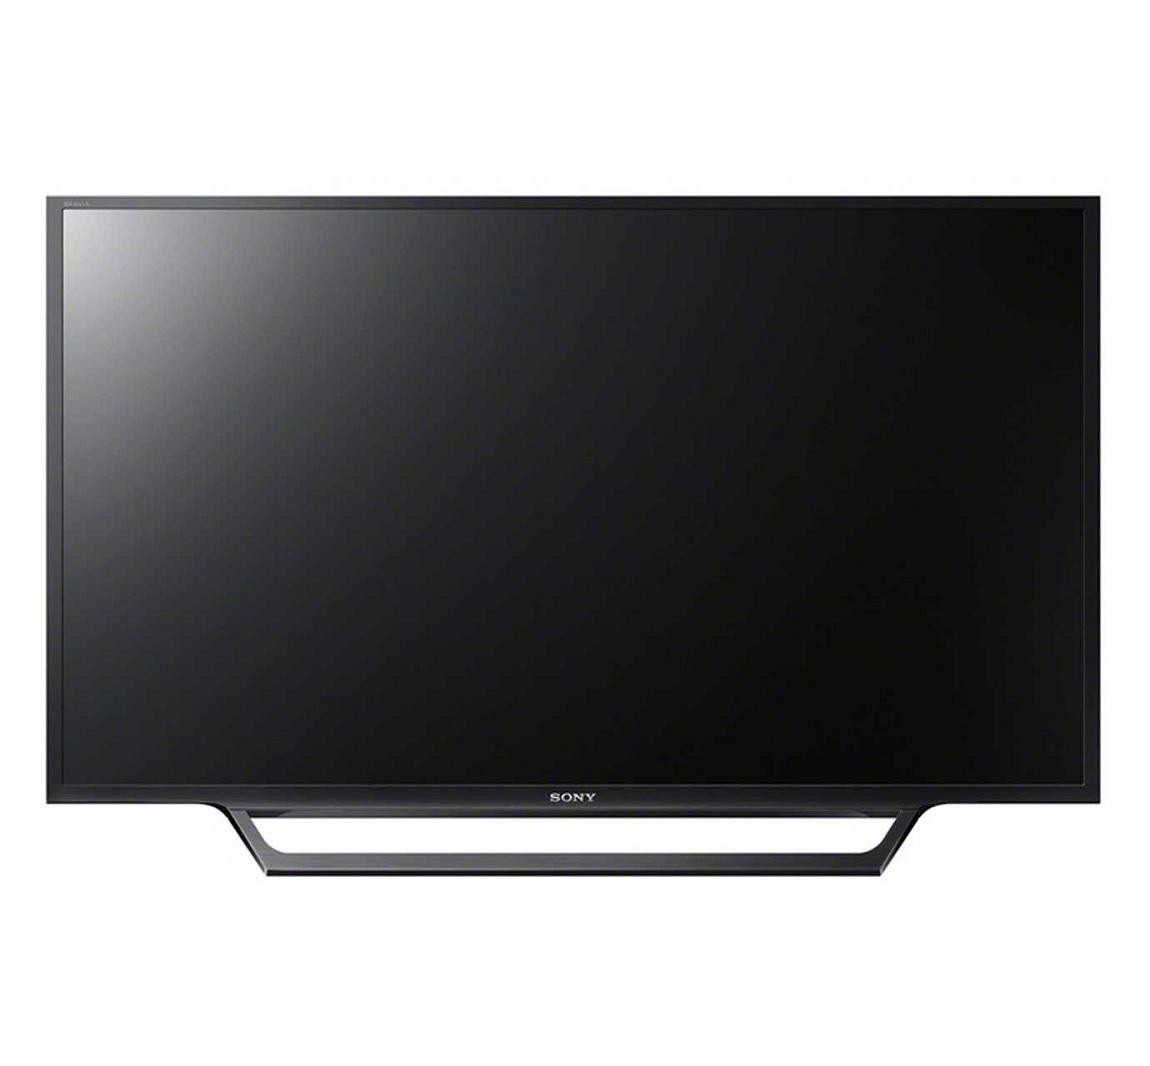 Sony-KDL-40RD453-1.jpg